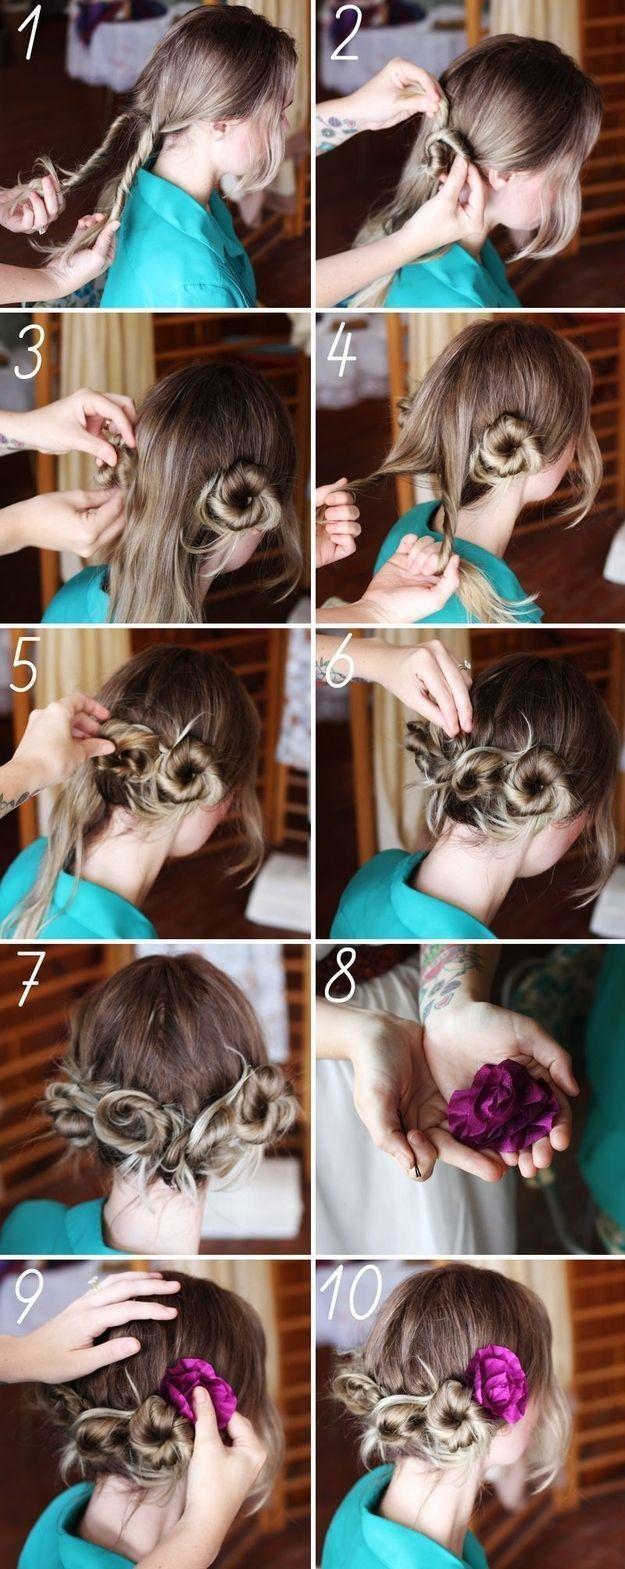 Cool diy hairstyles for girls hair styles pinterest hair